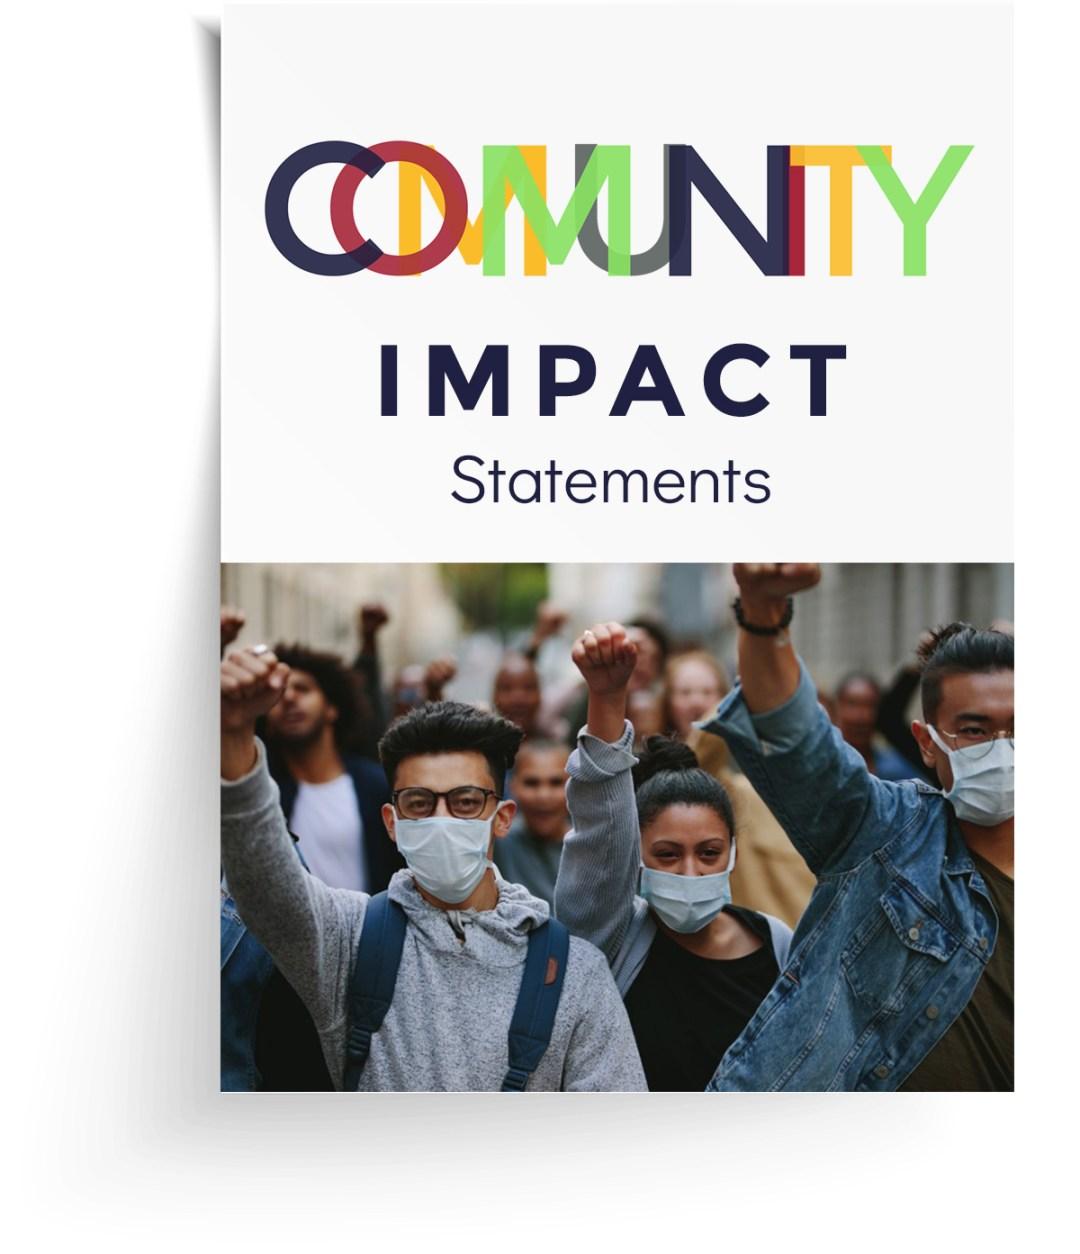 Community Impact Statements